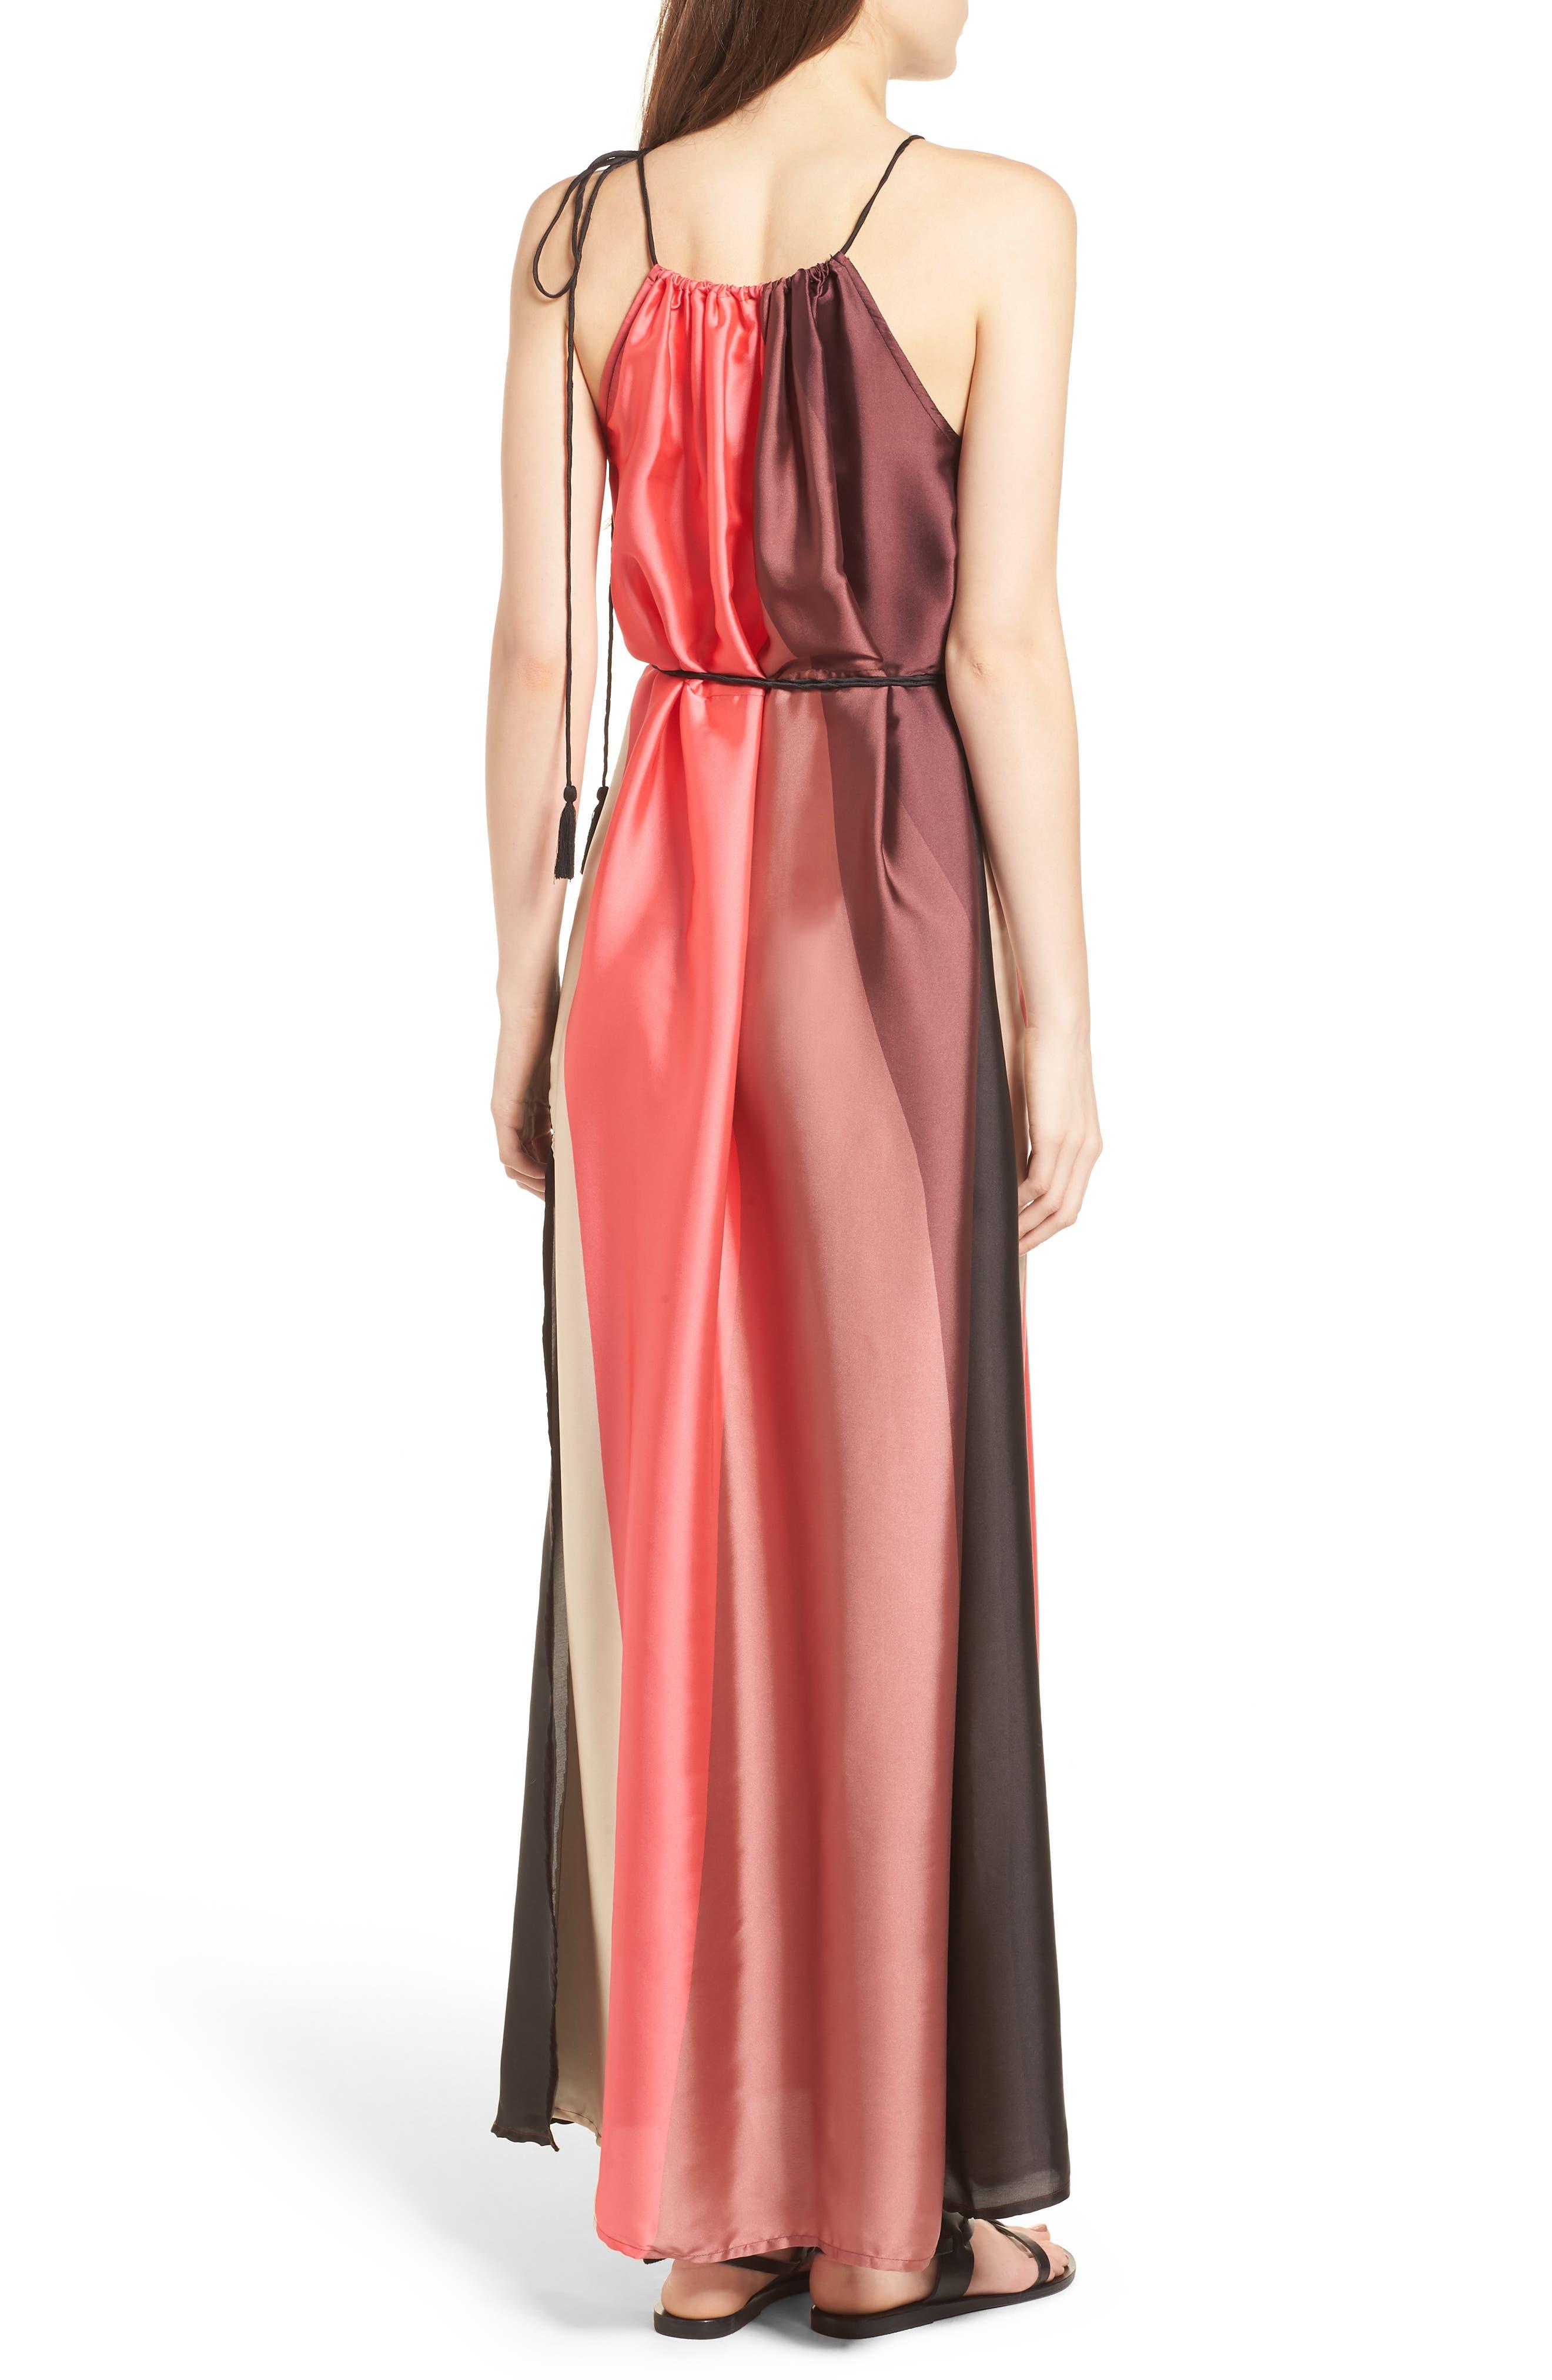 Icy Shores Maxi Dress,                             Alternate thumbnail 2, color,                             903